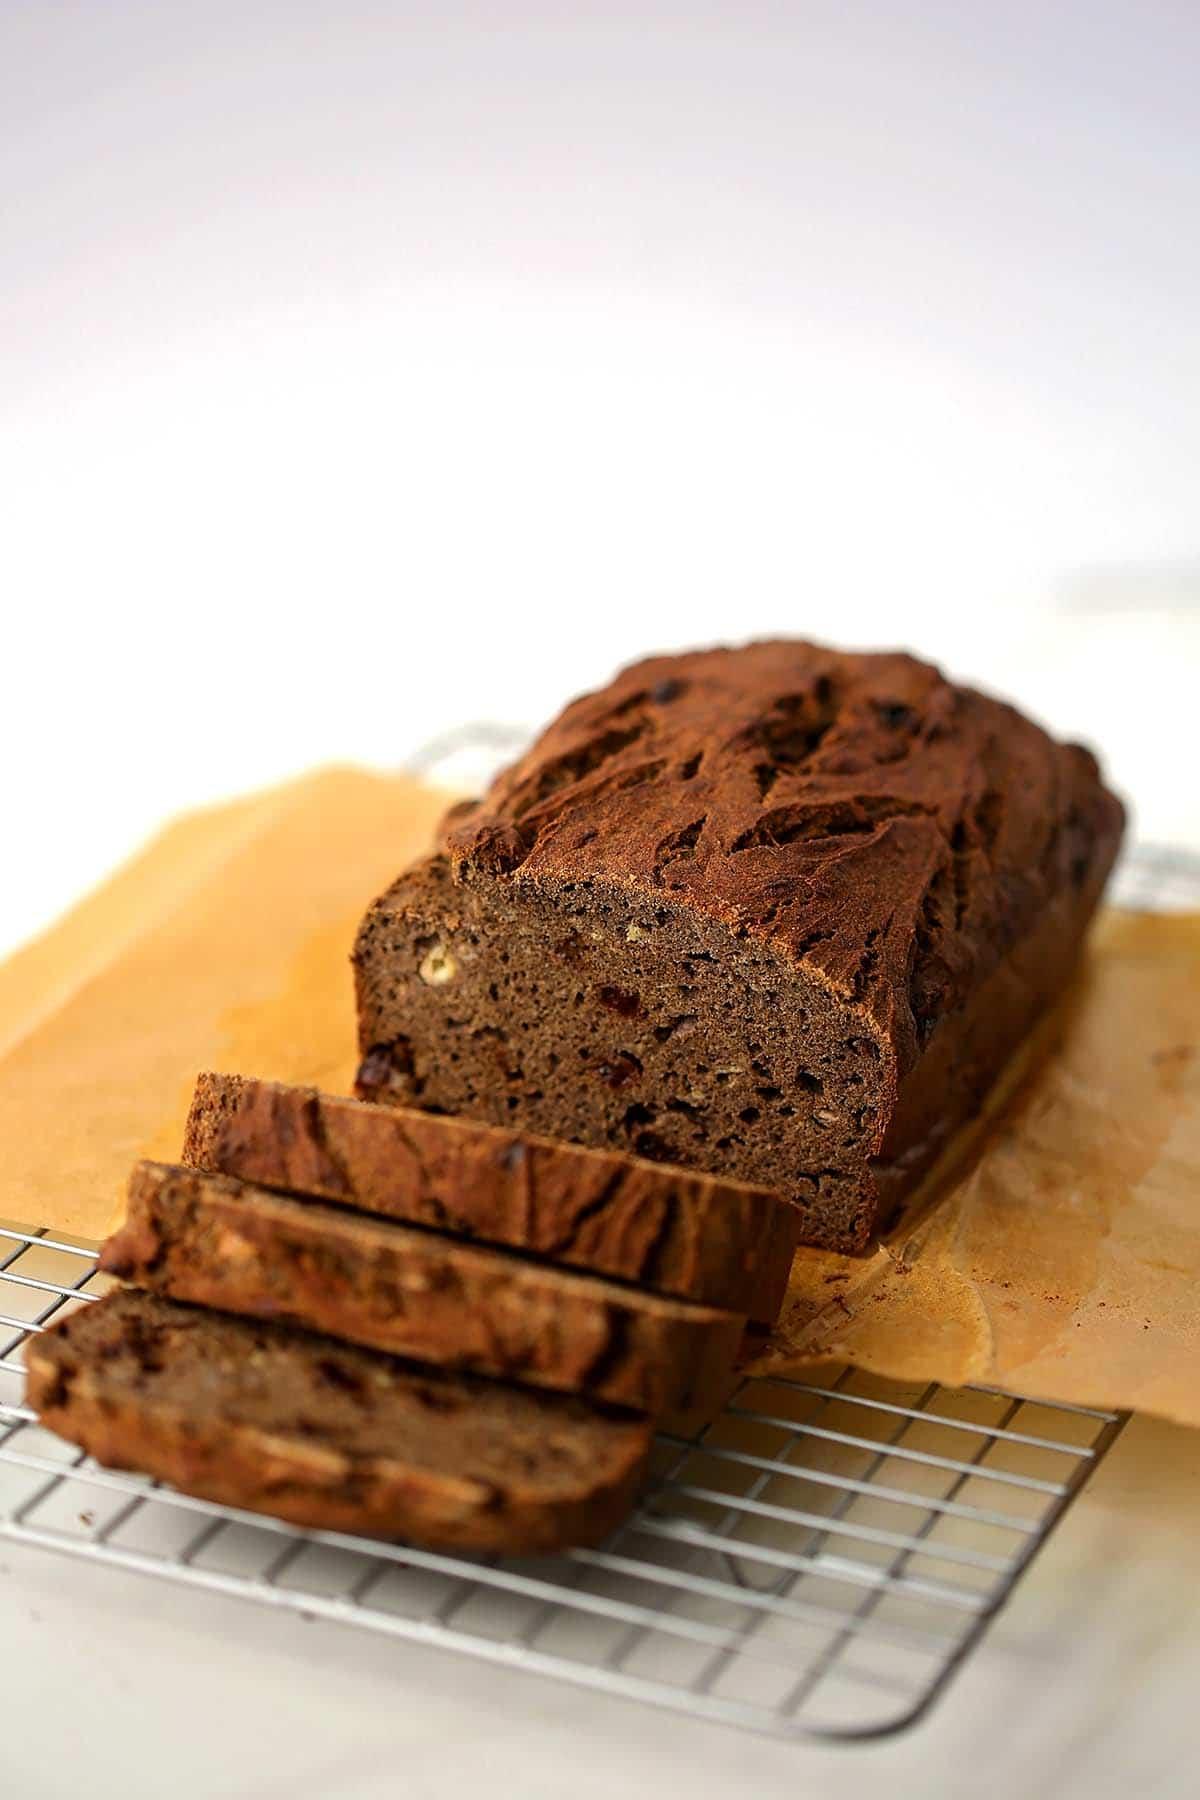 banana bread sliced on the cutting board